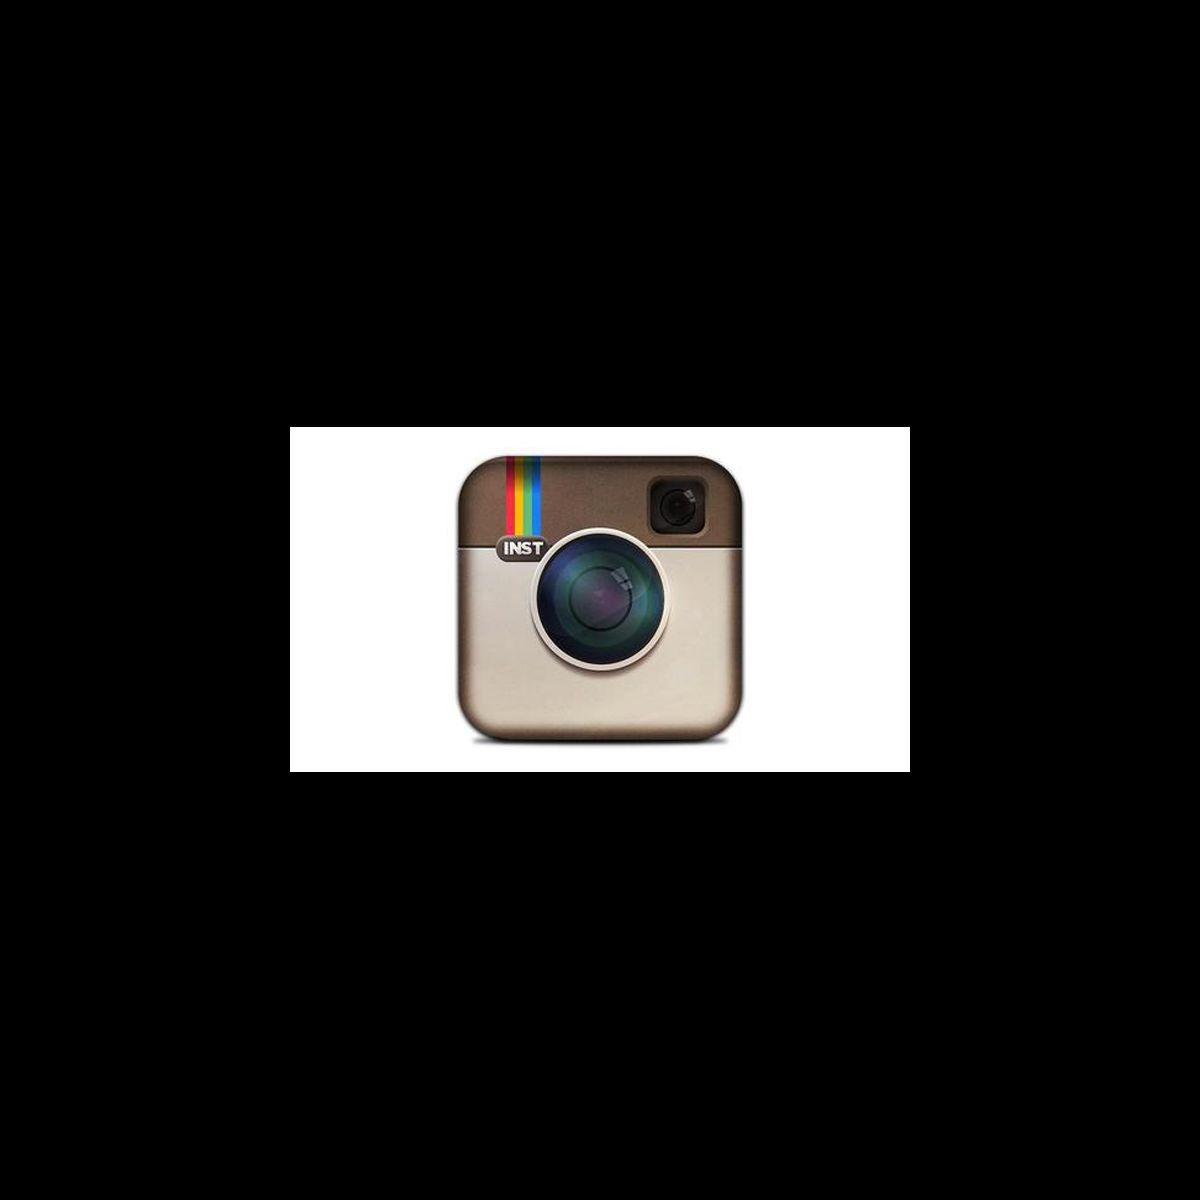 L Application Instagram Photo Puremedias